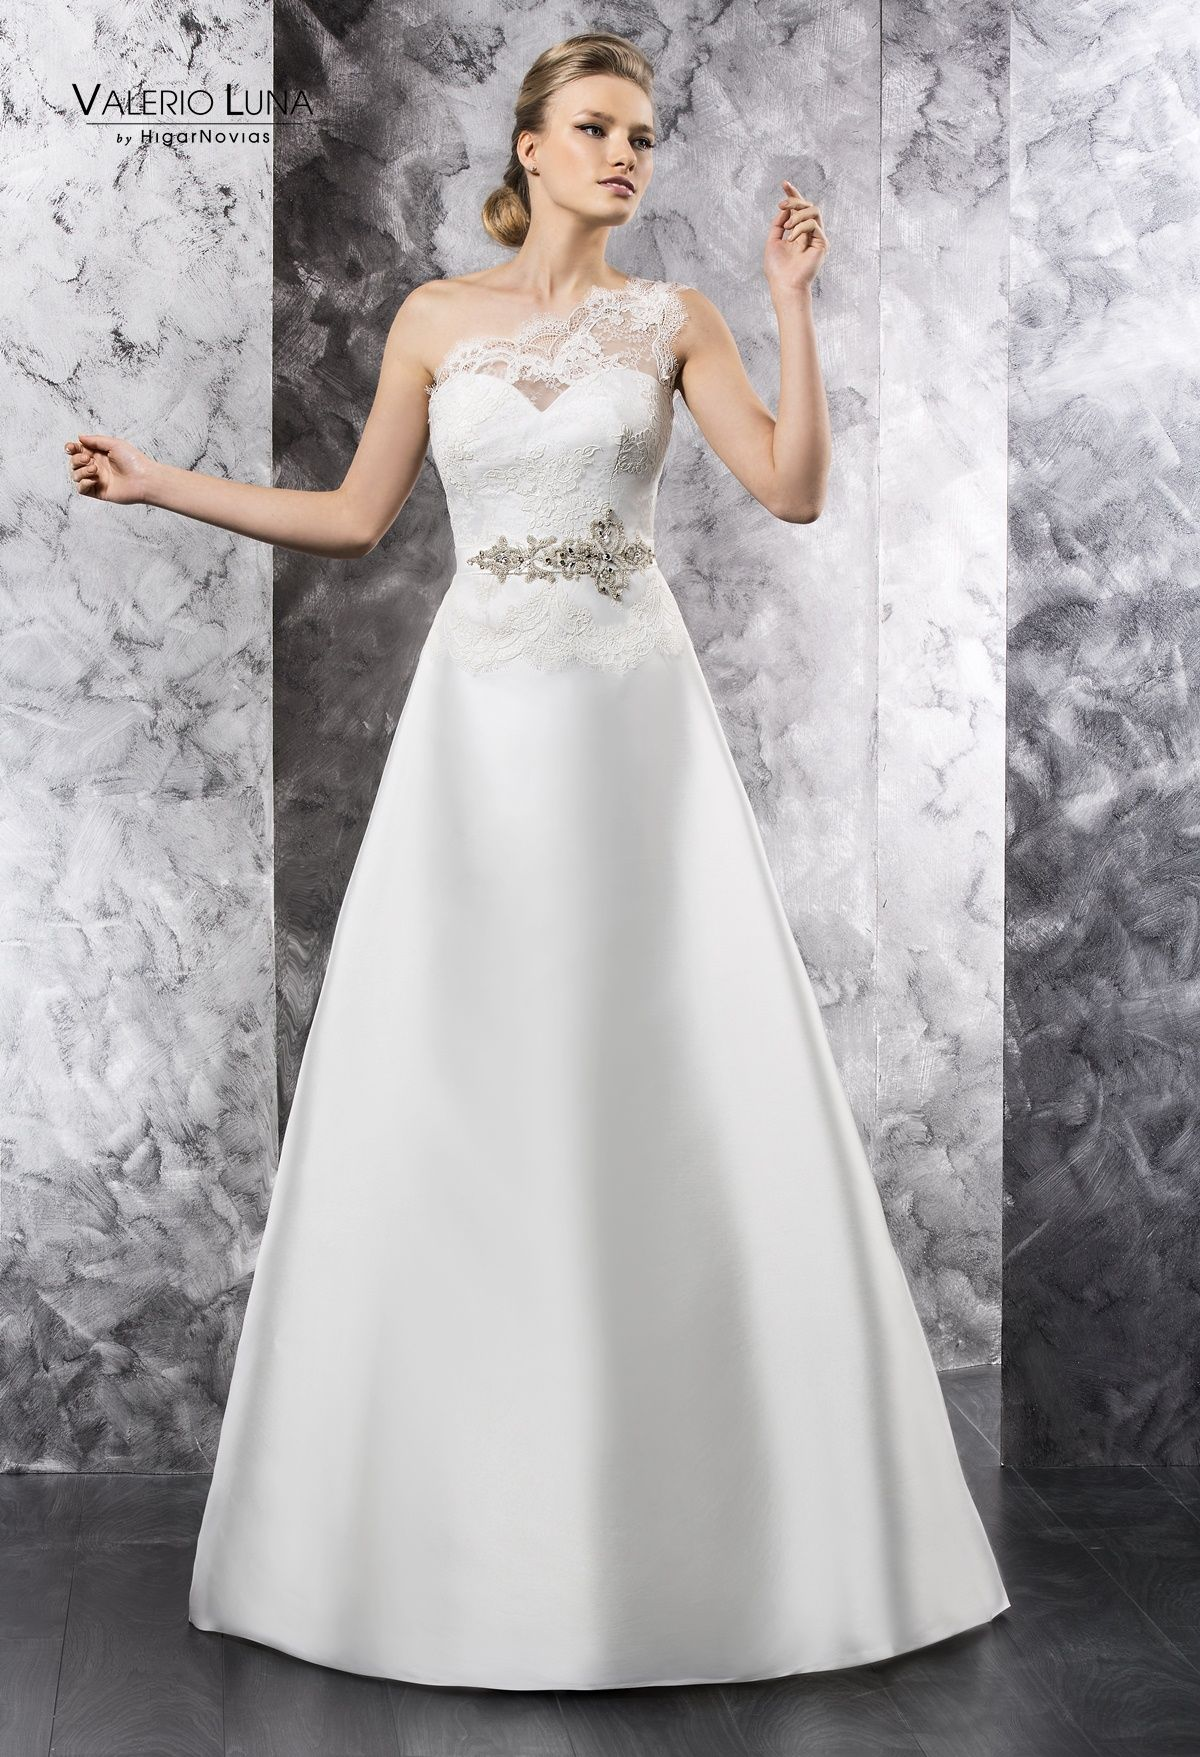 Vestidos de novia faldas amplias